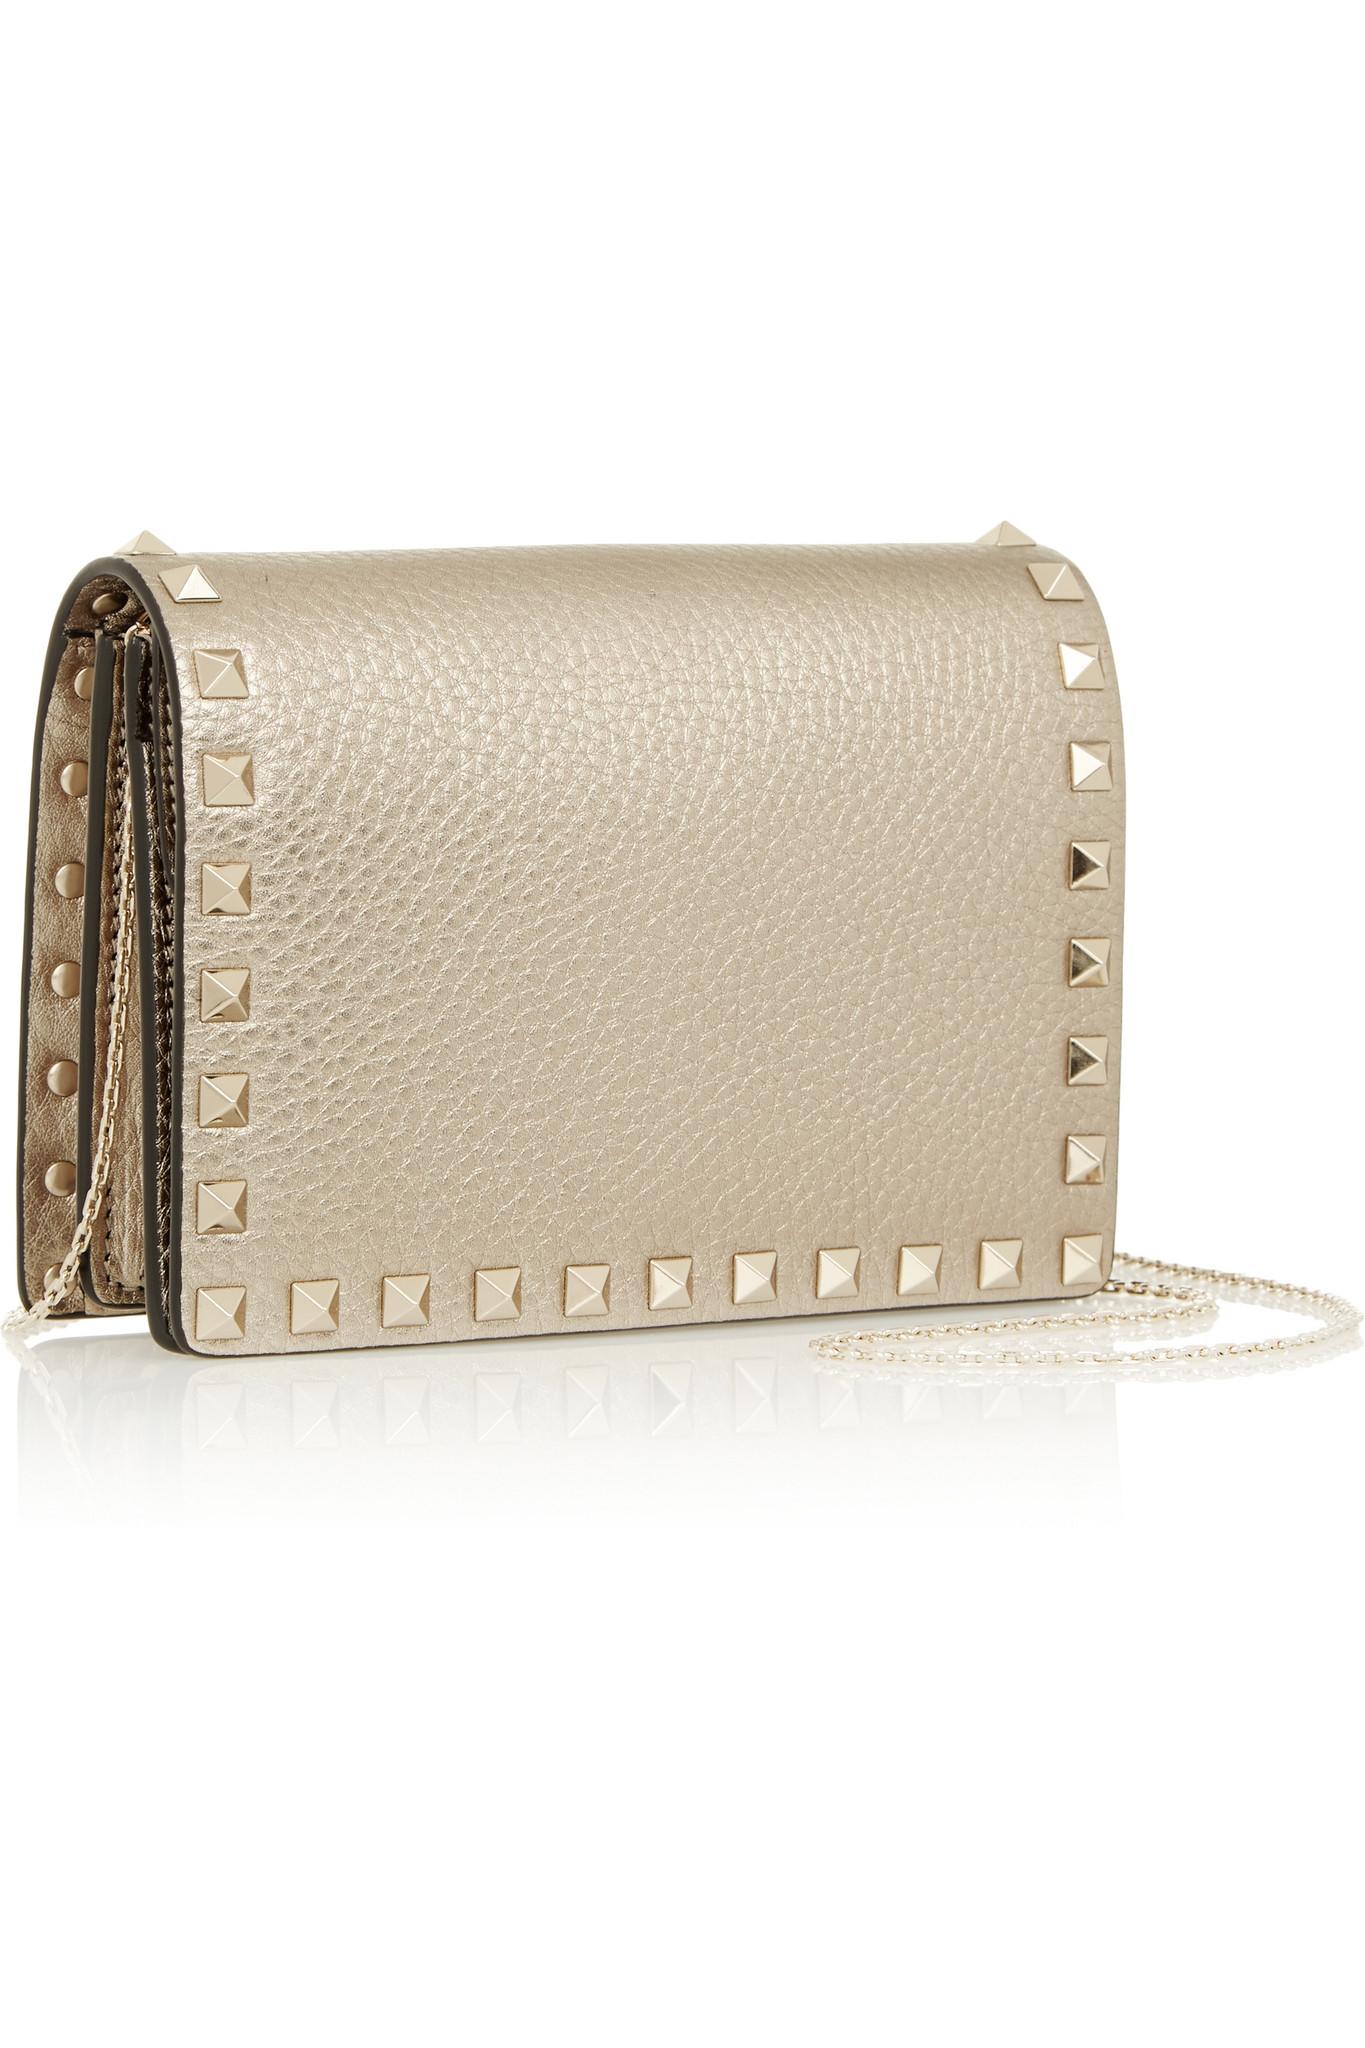 The Rockstud Metallic Textured-leather Cardholder - Gold Valentino 5avIFFeTW3